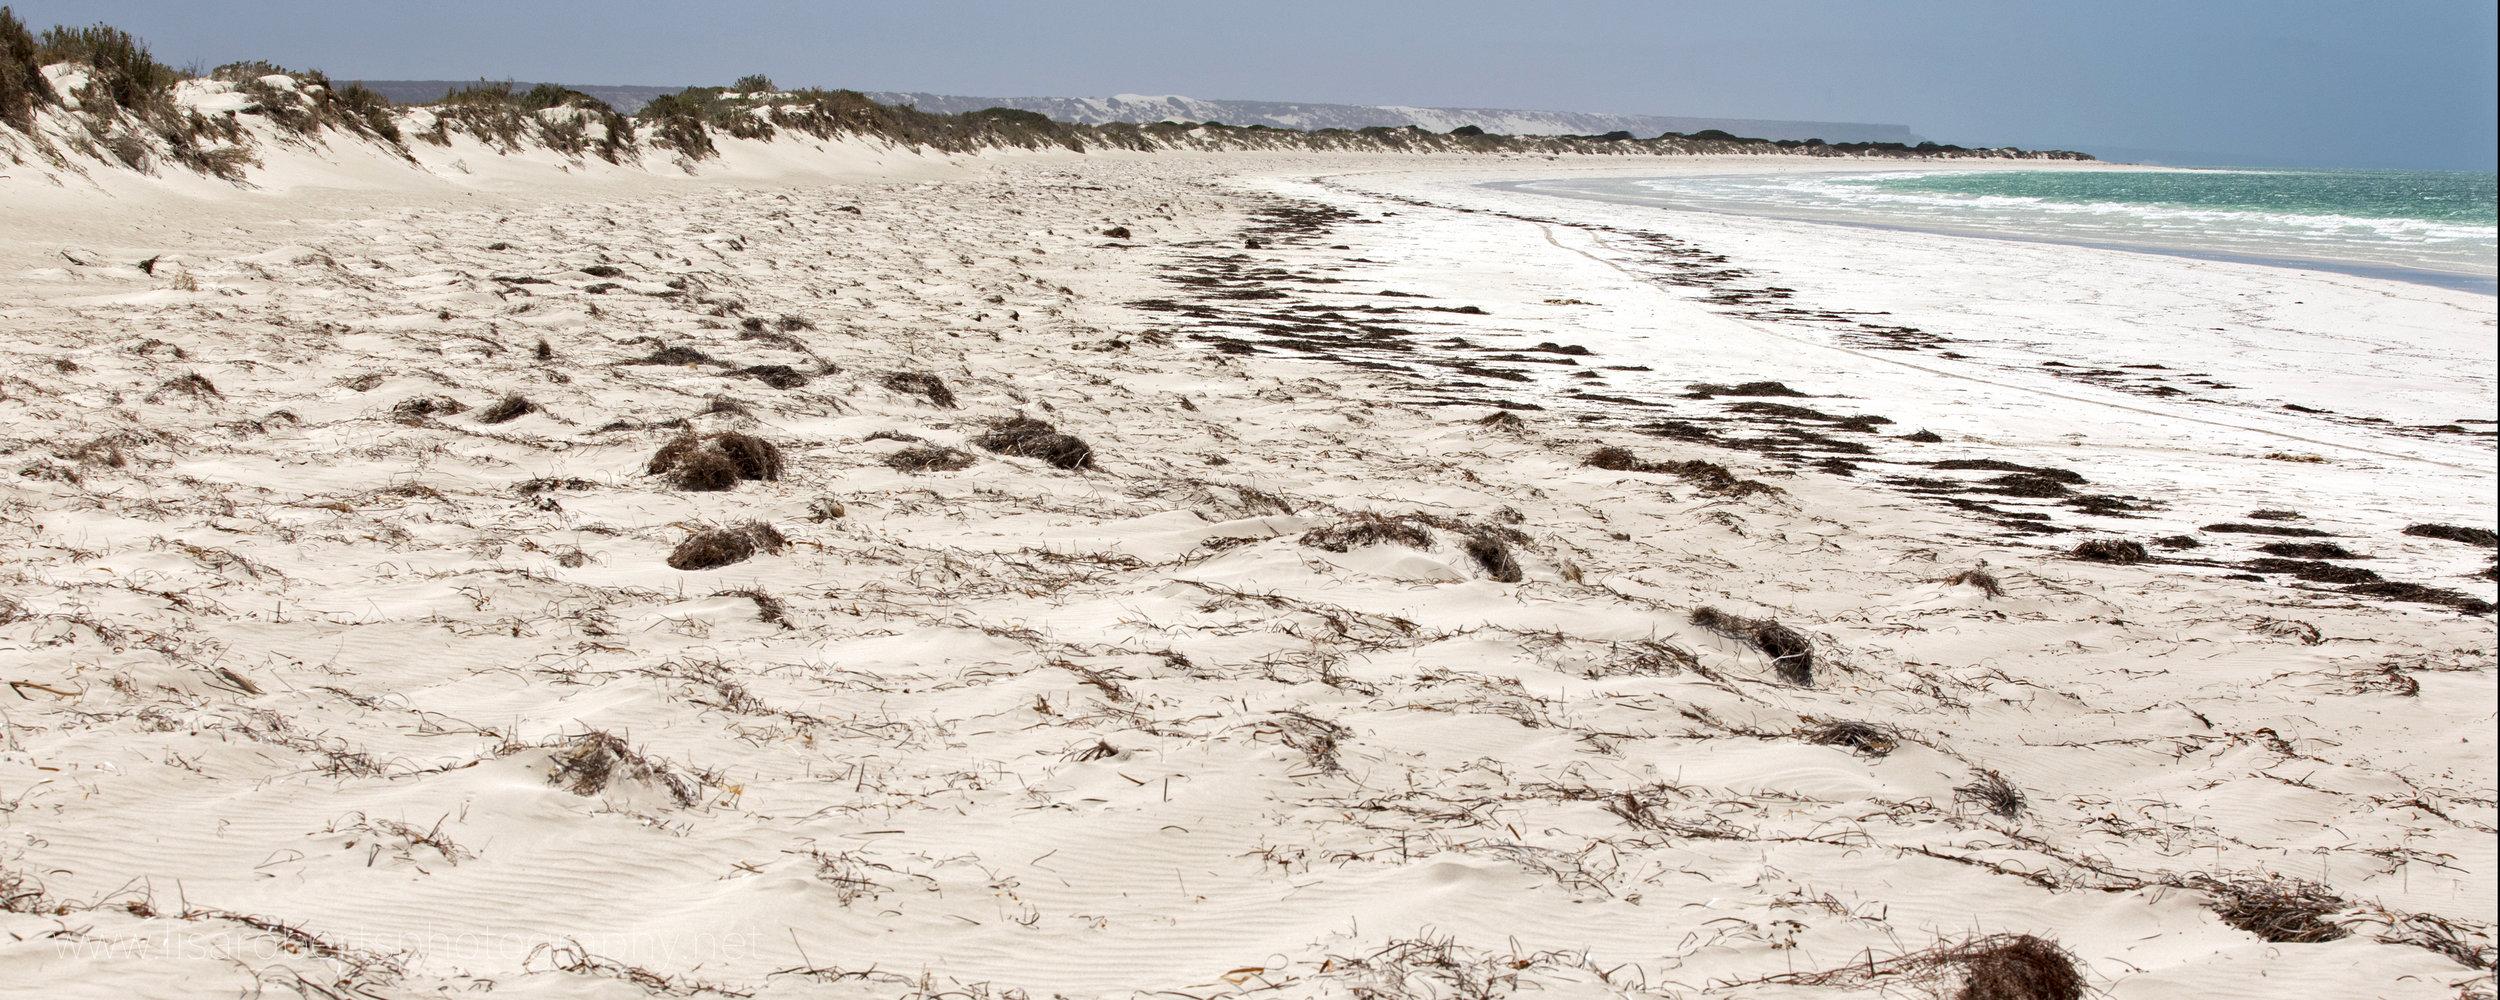 Deserted beach, Western Australia